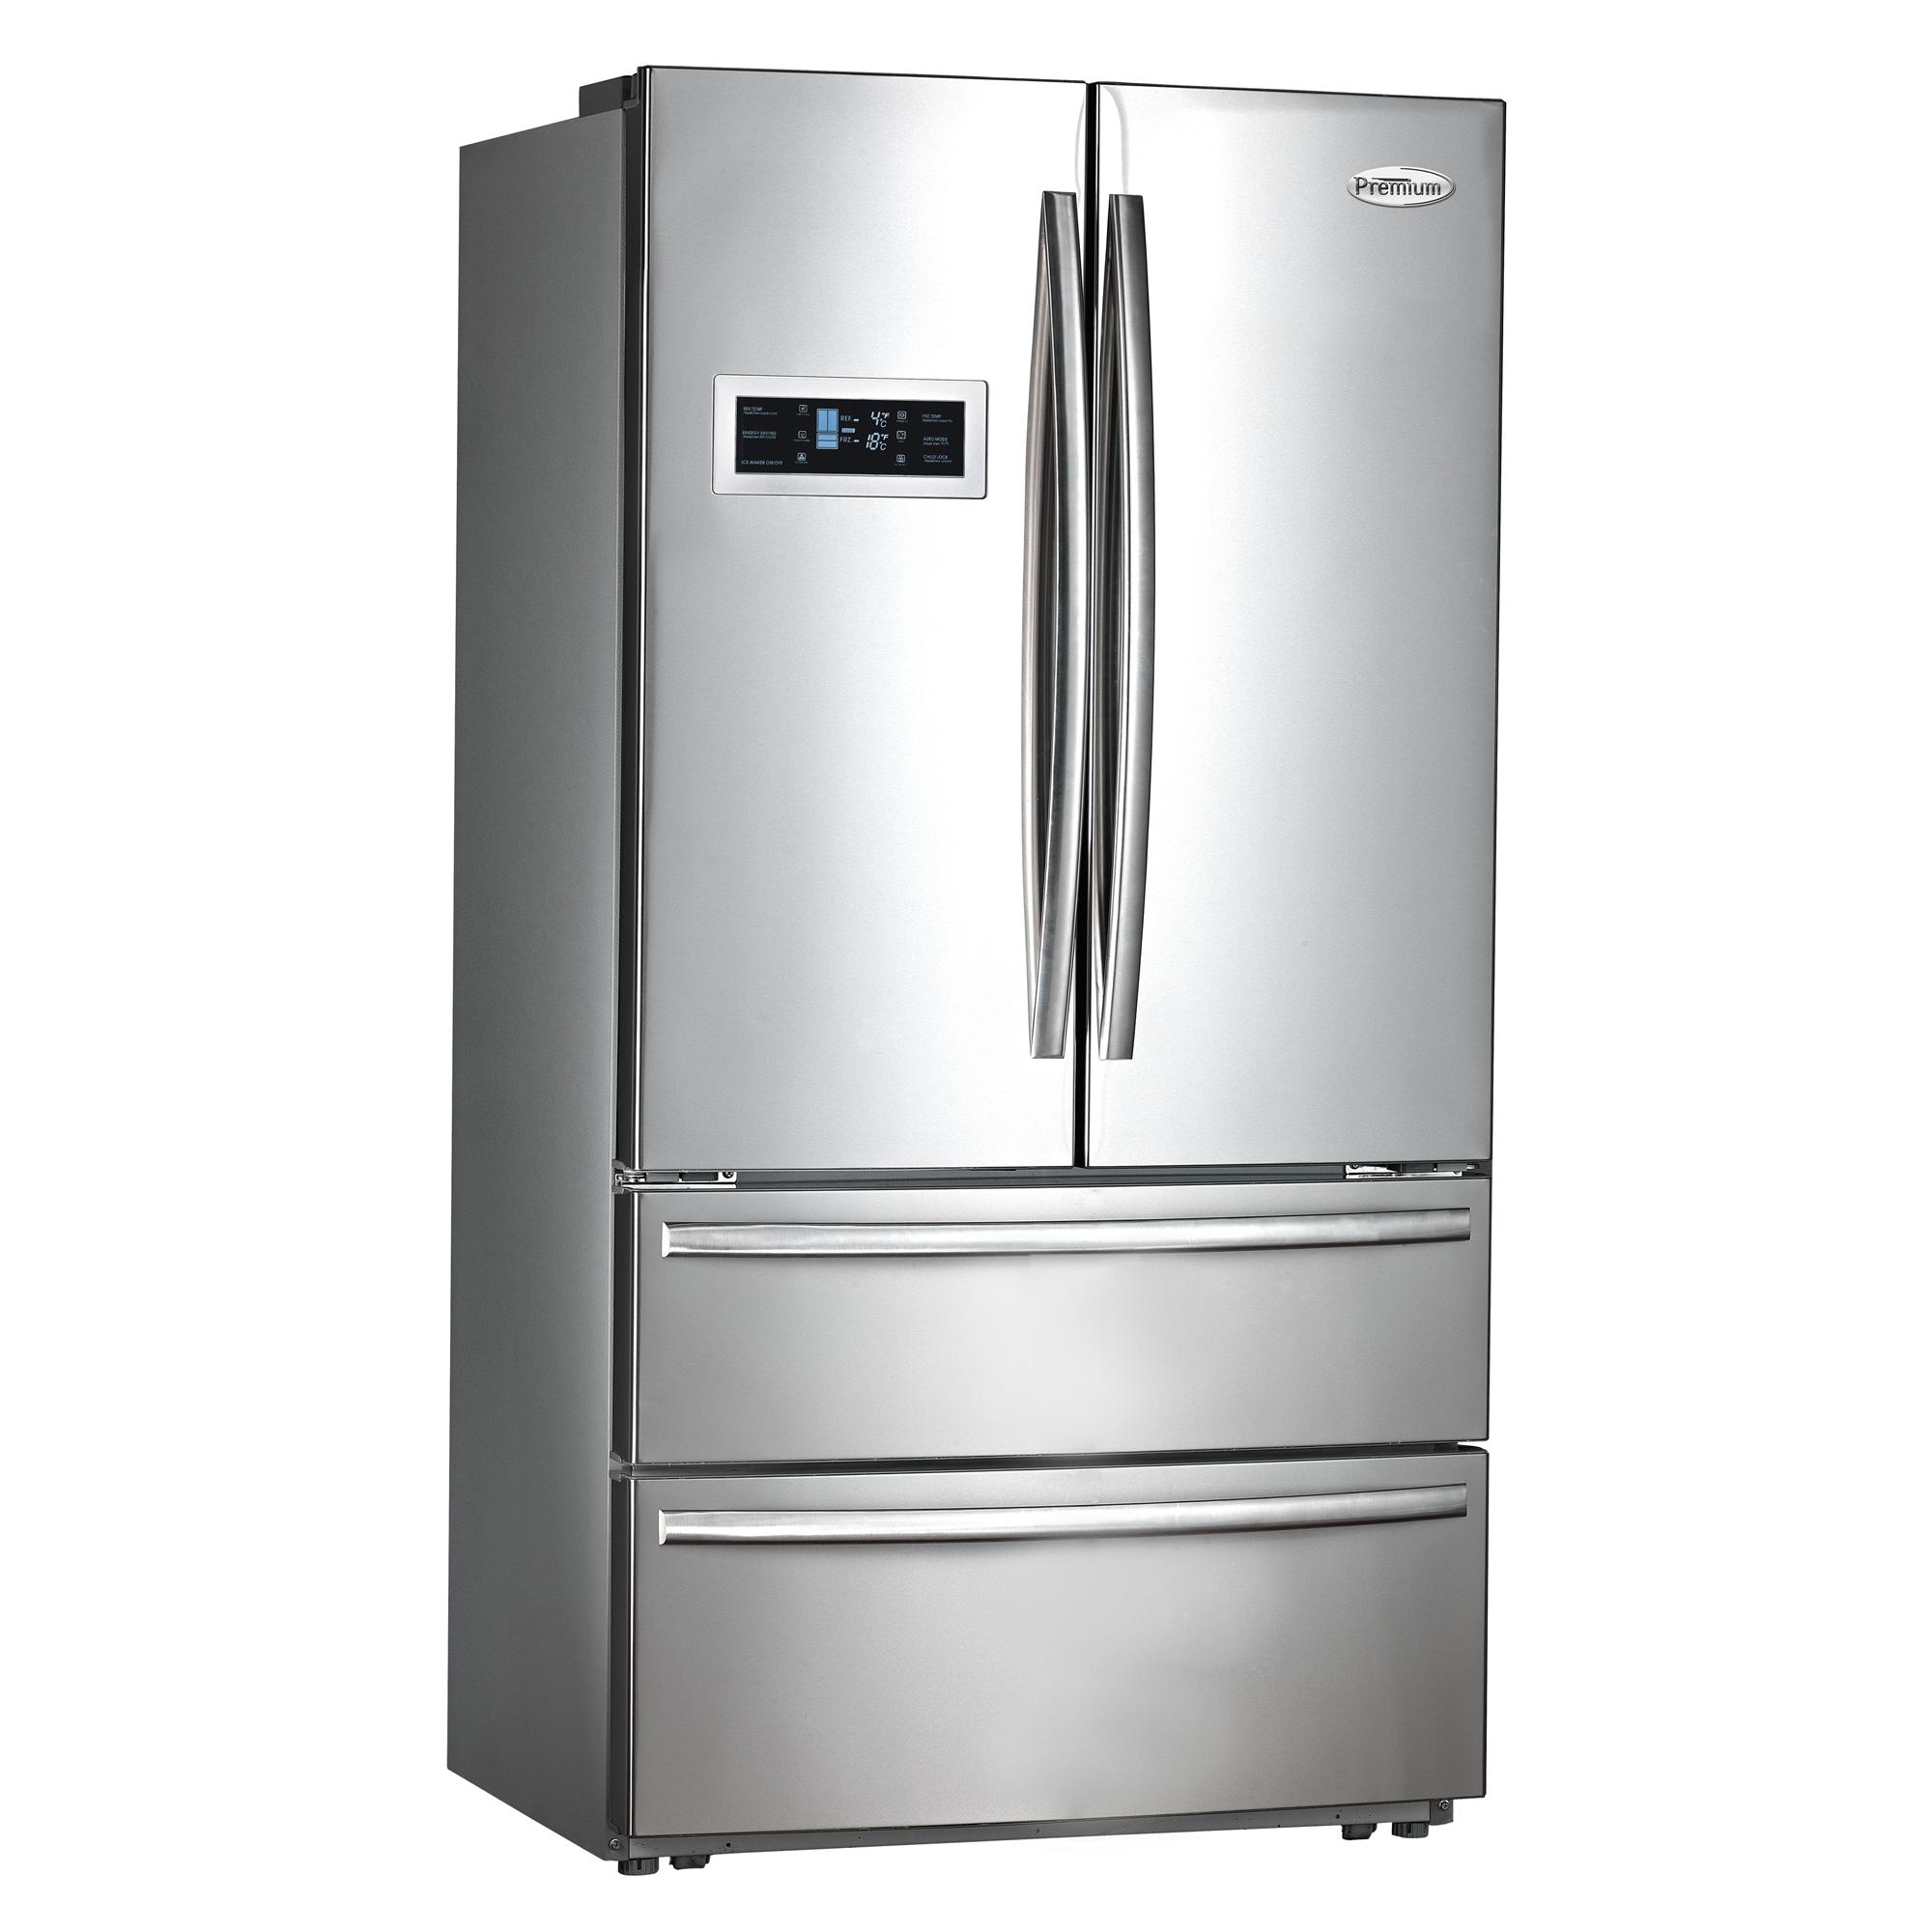 premium appliances 20 8 ft french door refrigerator. Black Bedroom Furniture Sets. Home Design Ideas